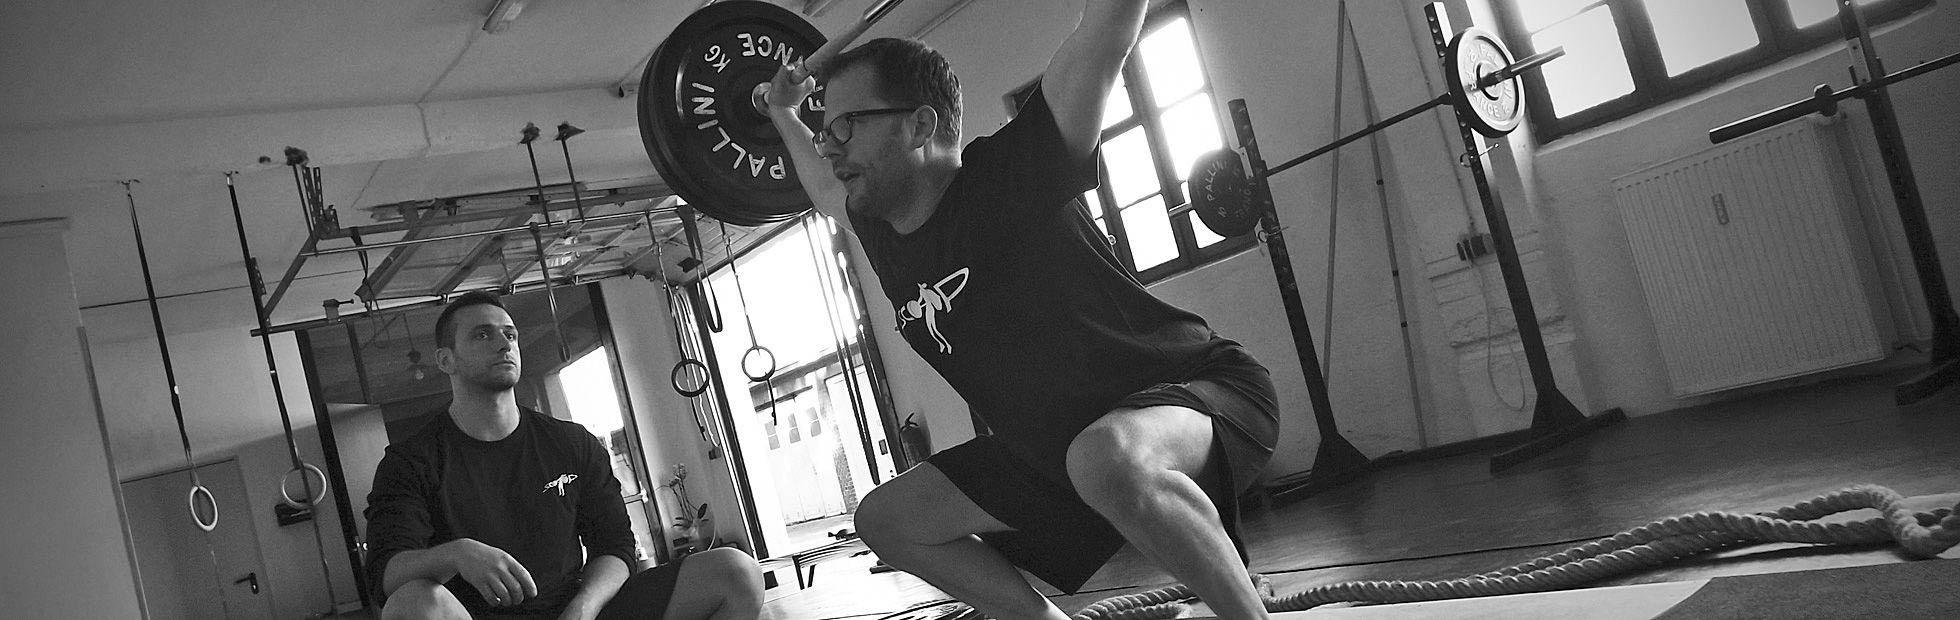 Personal Trainer beim Fitnesstraining